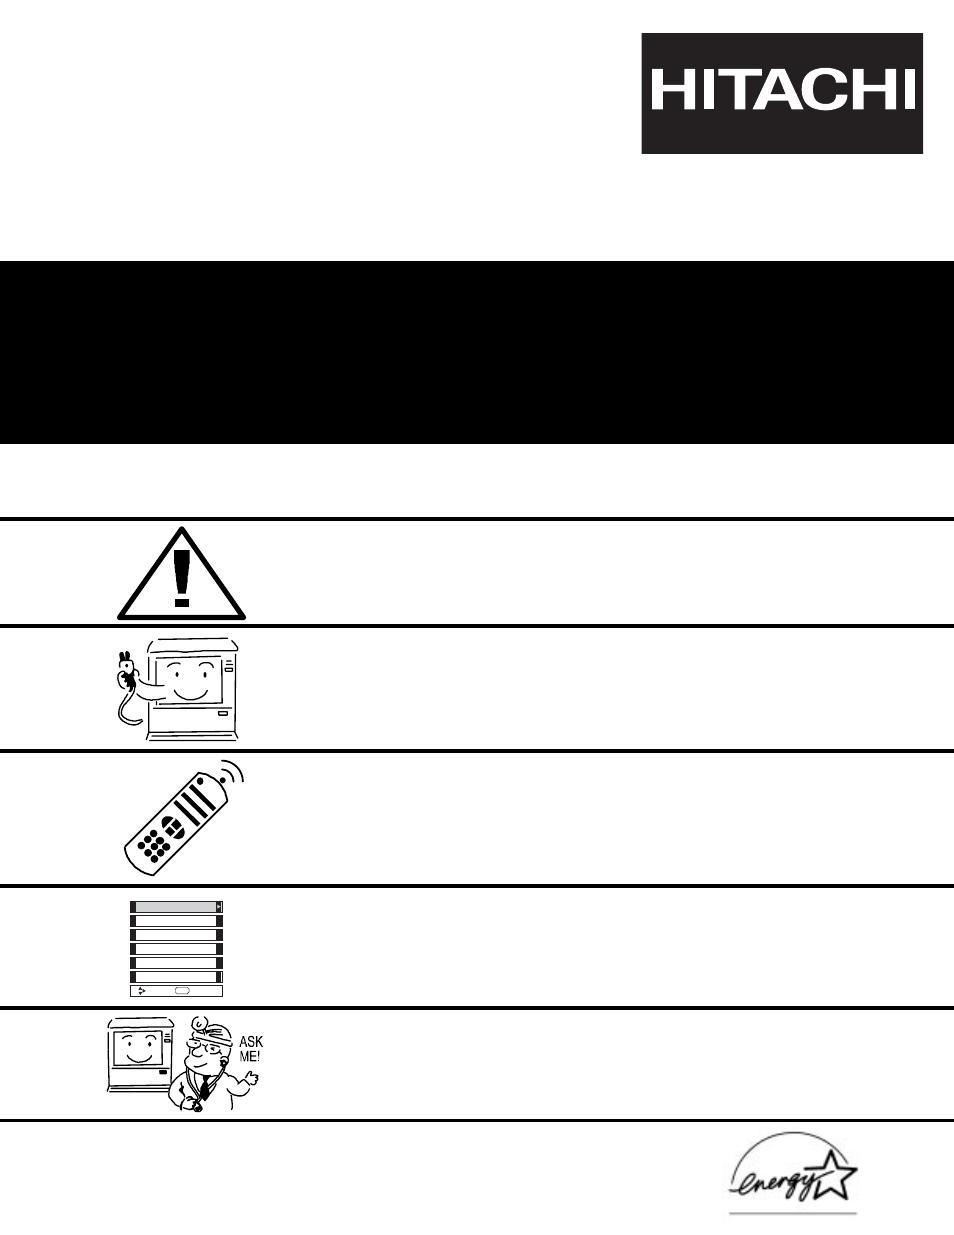 hitachi 50v500 user manual 84 pages rh manualsdir com AT&T LG A340 Manual Hitachi StarBoard Manual